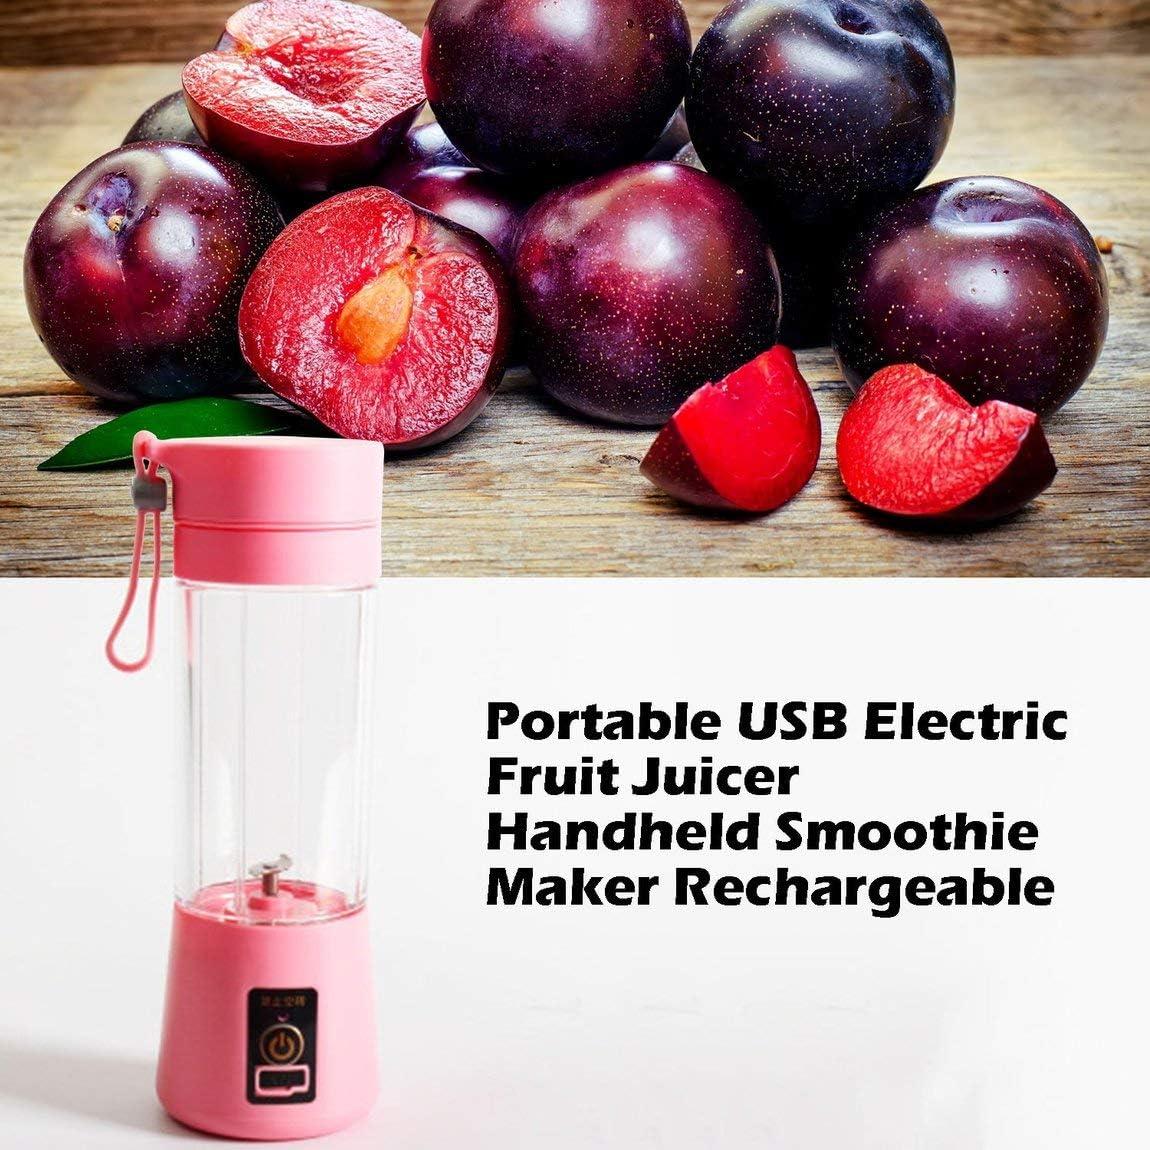 SeniorMar Tamaño portátil USB Exprimidor de Frutas eléctrico Batidora de Mano Licuadora Recargable Mini Taza de Jugo portátil Agua Rosado